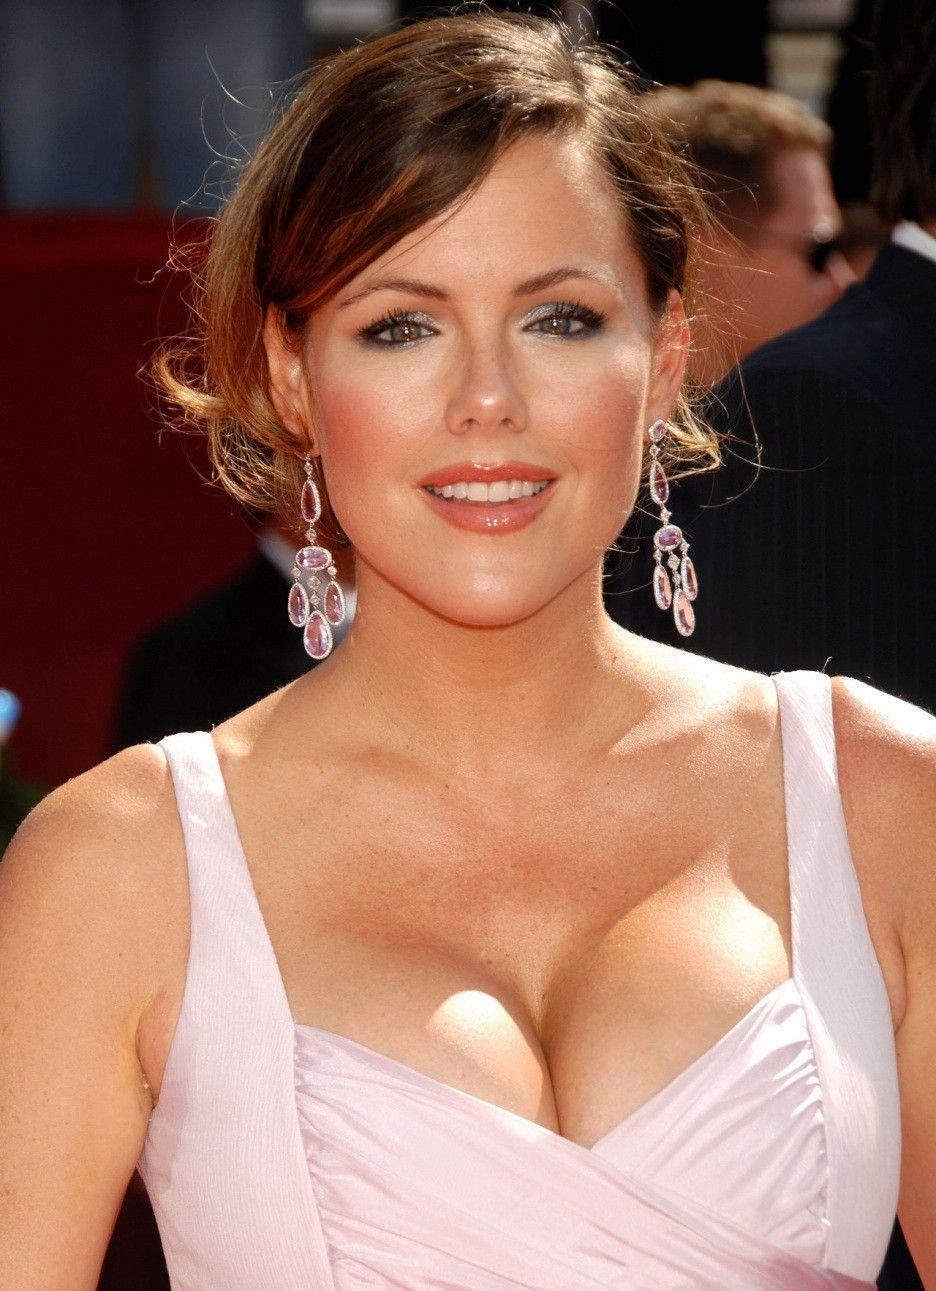 Celebrity Kathleen Robertson nudes (24 photo), Tits, Bikini, Selfie, lingerie 2019